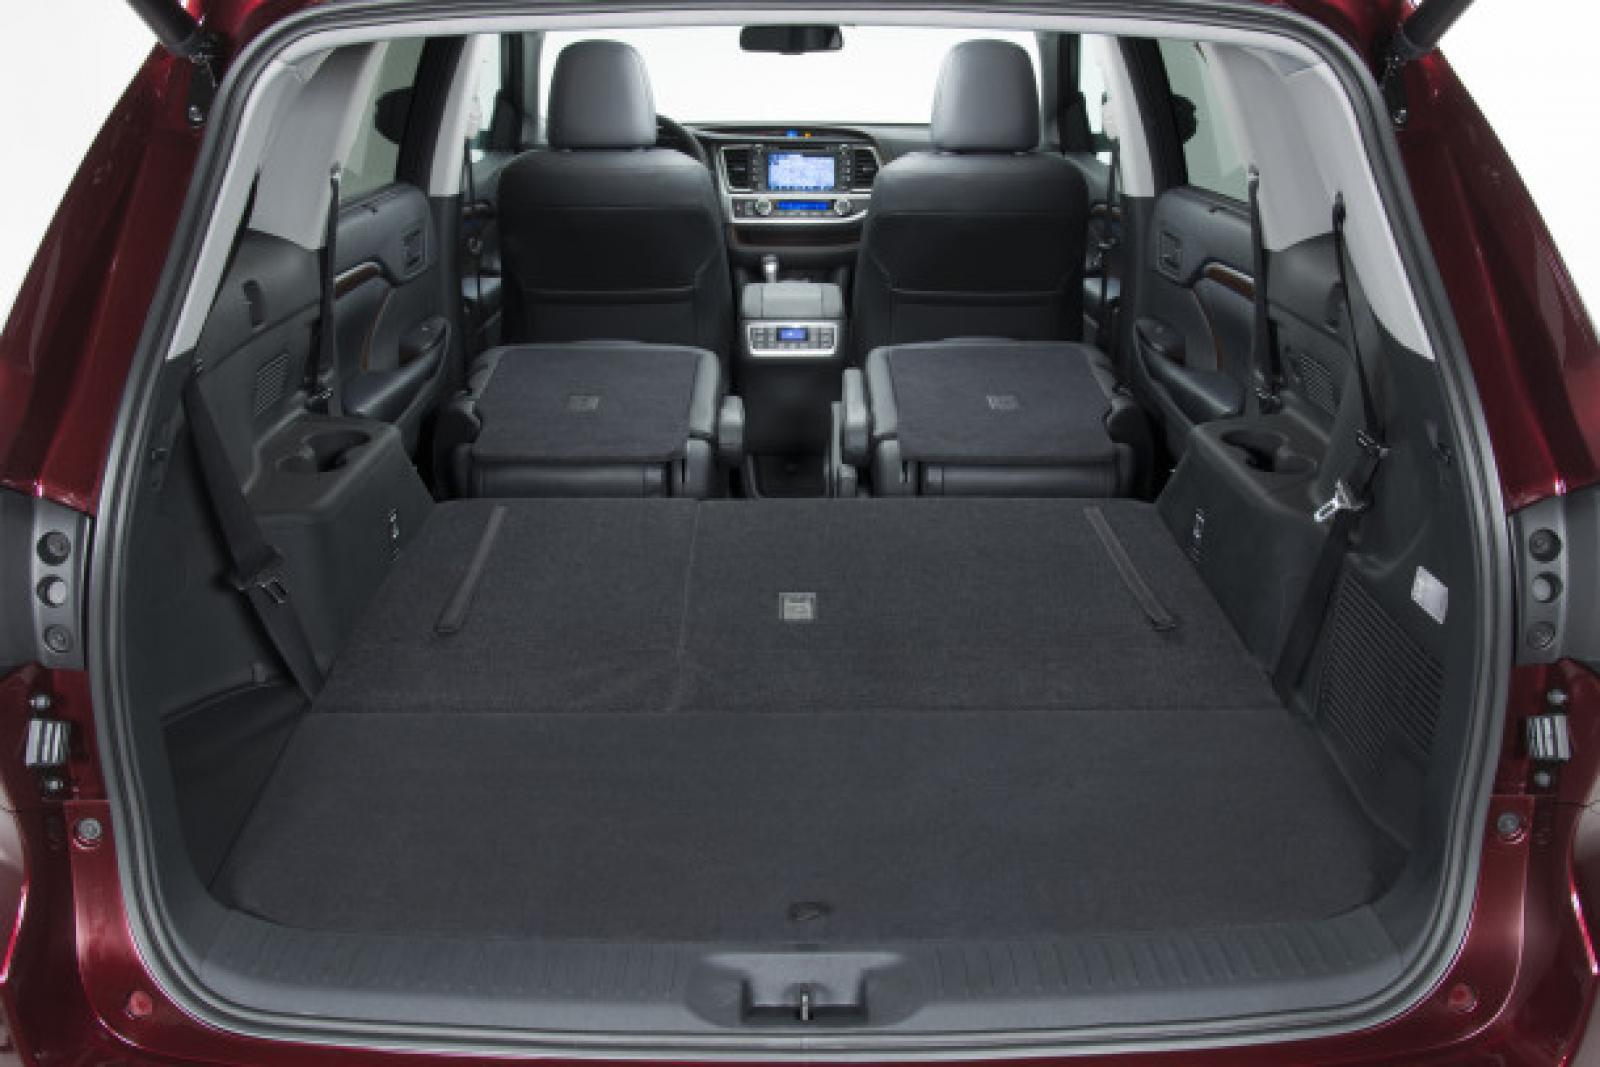 ... 2015 Toyota Highlander Hybrid #11 800 1024 1280 1600 Origin ...